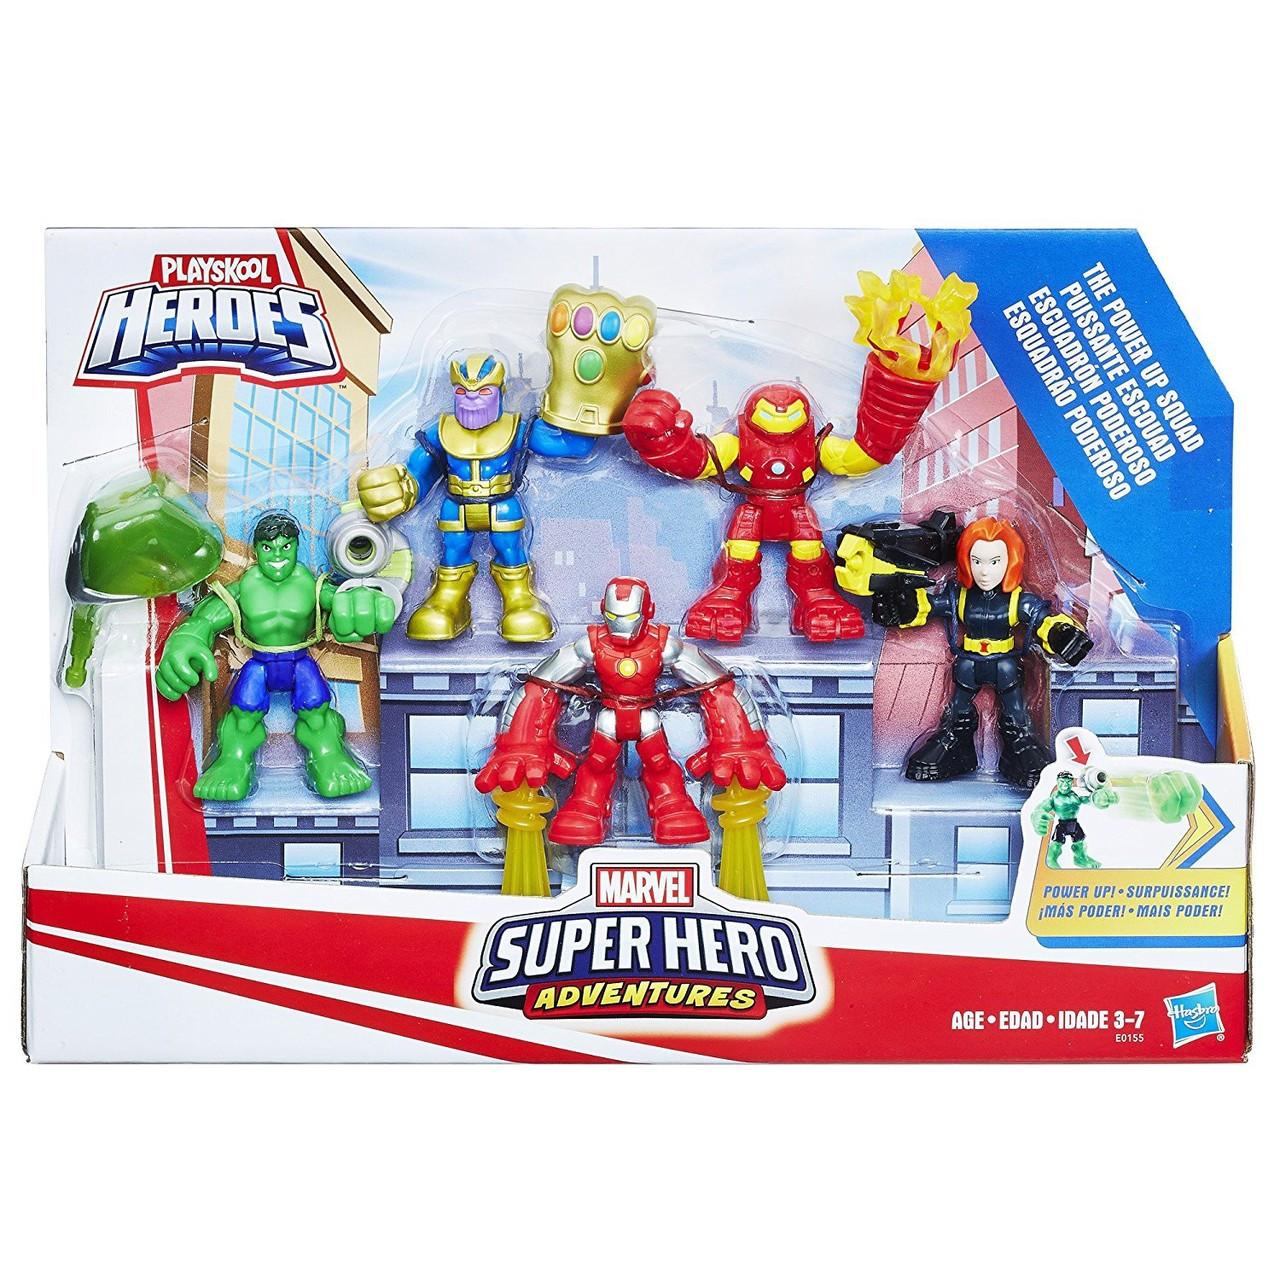 Playskool Heroes Super Hero Adventures 2 Hulk  /& Ironman Figures Power Up Squad